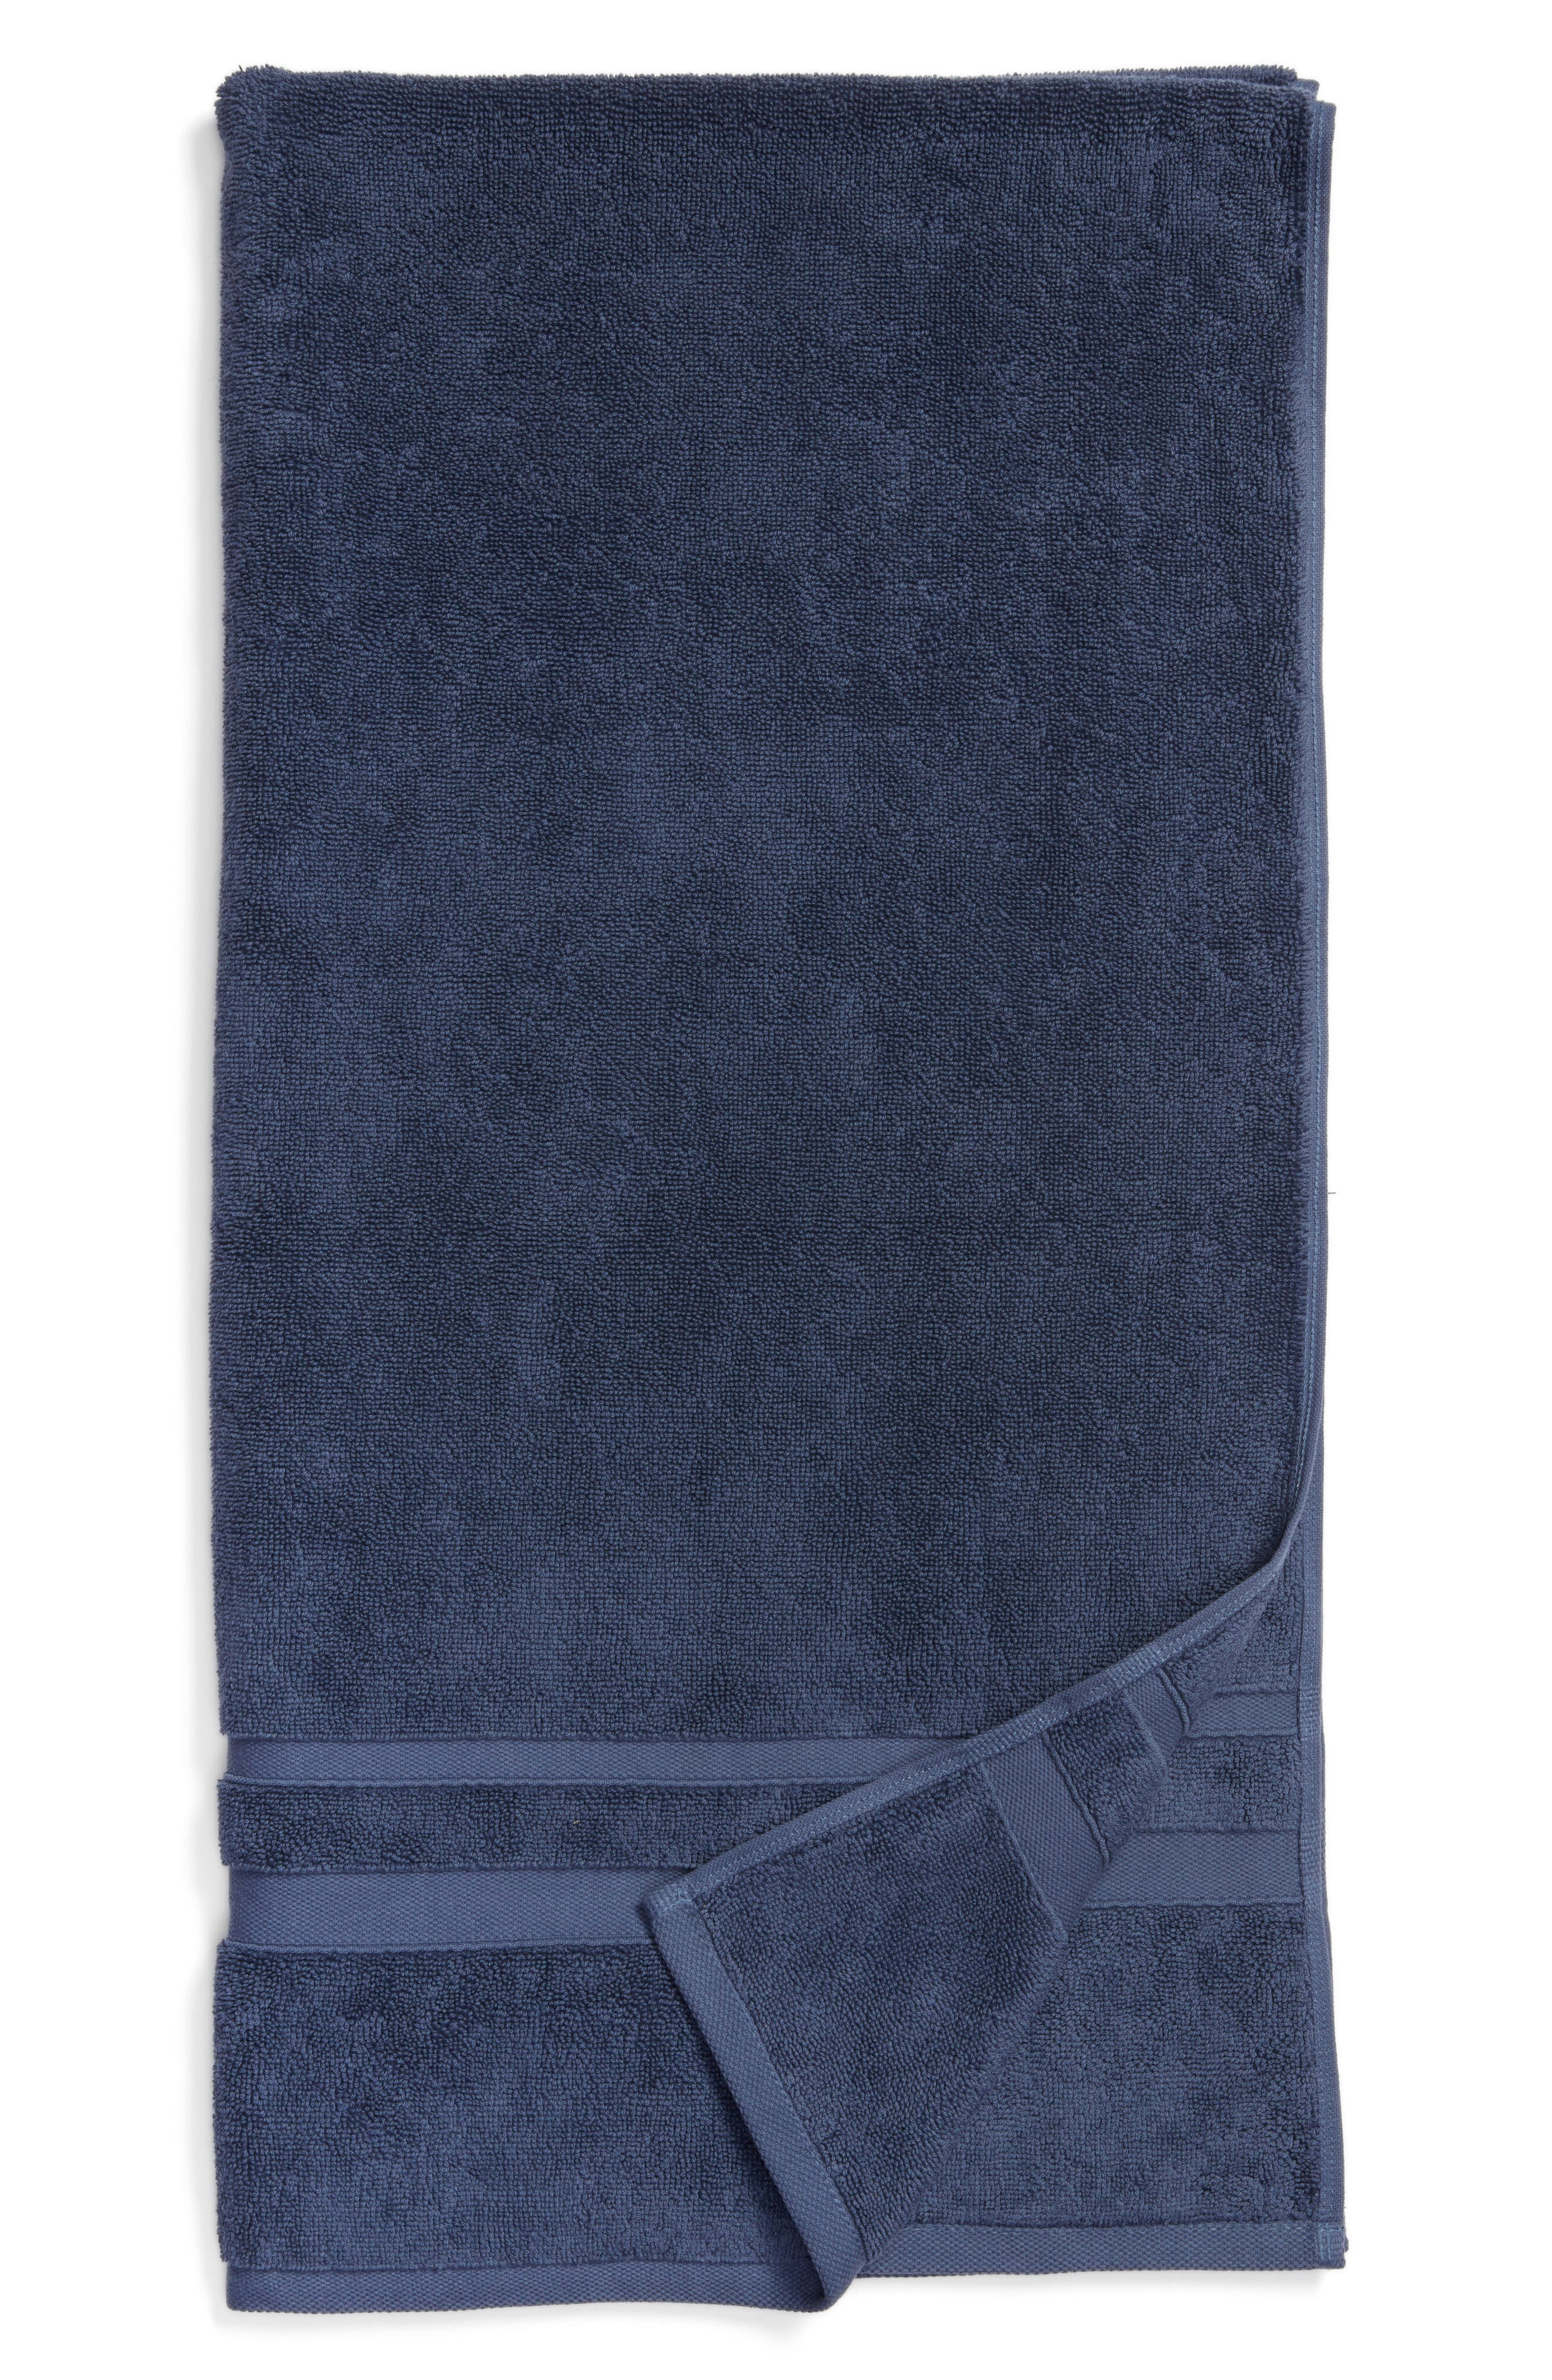 Studio 'Perennial' Turkish Cotton Bath Towel,                         Main,                         color, INDIGO BLUE